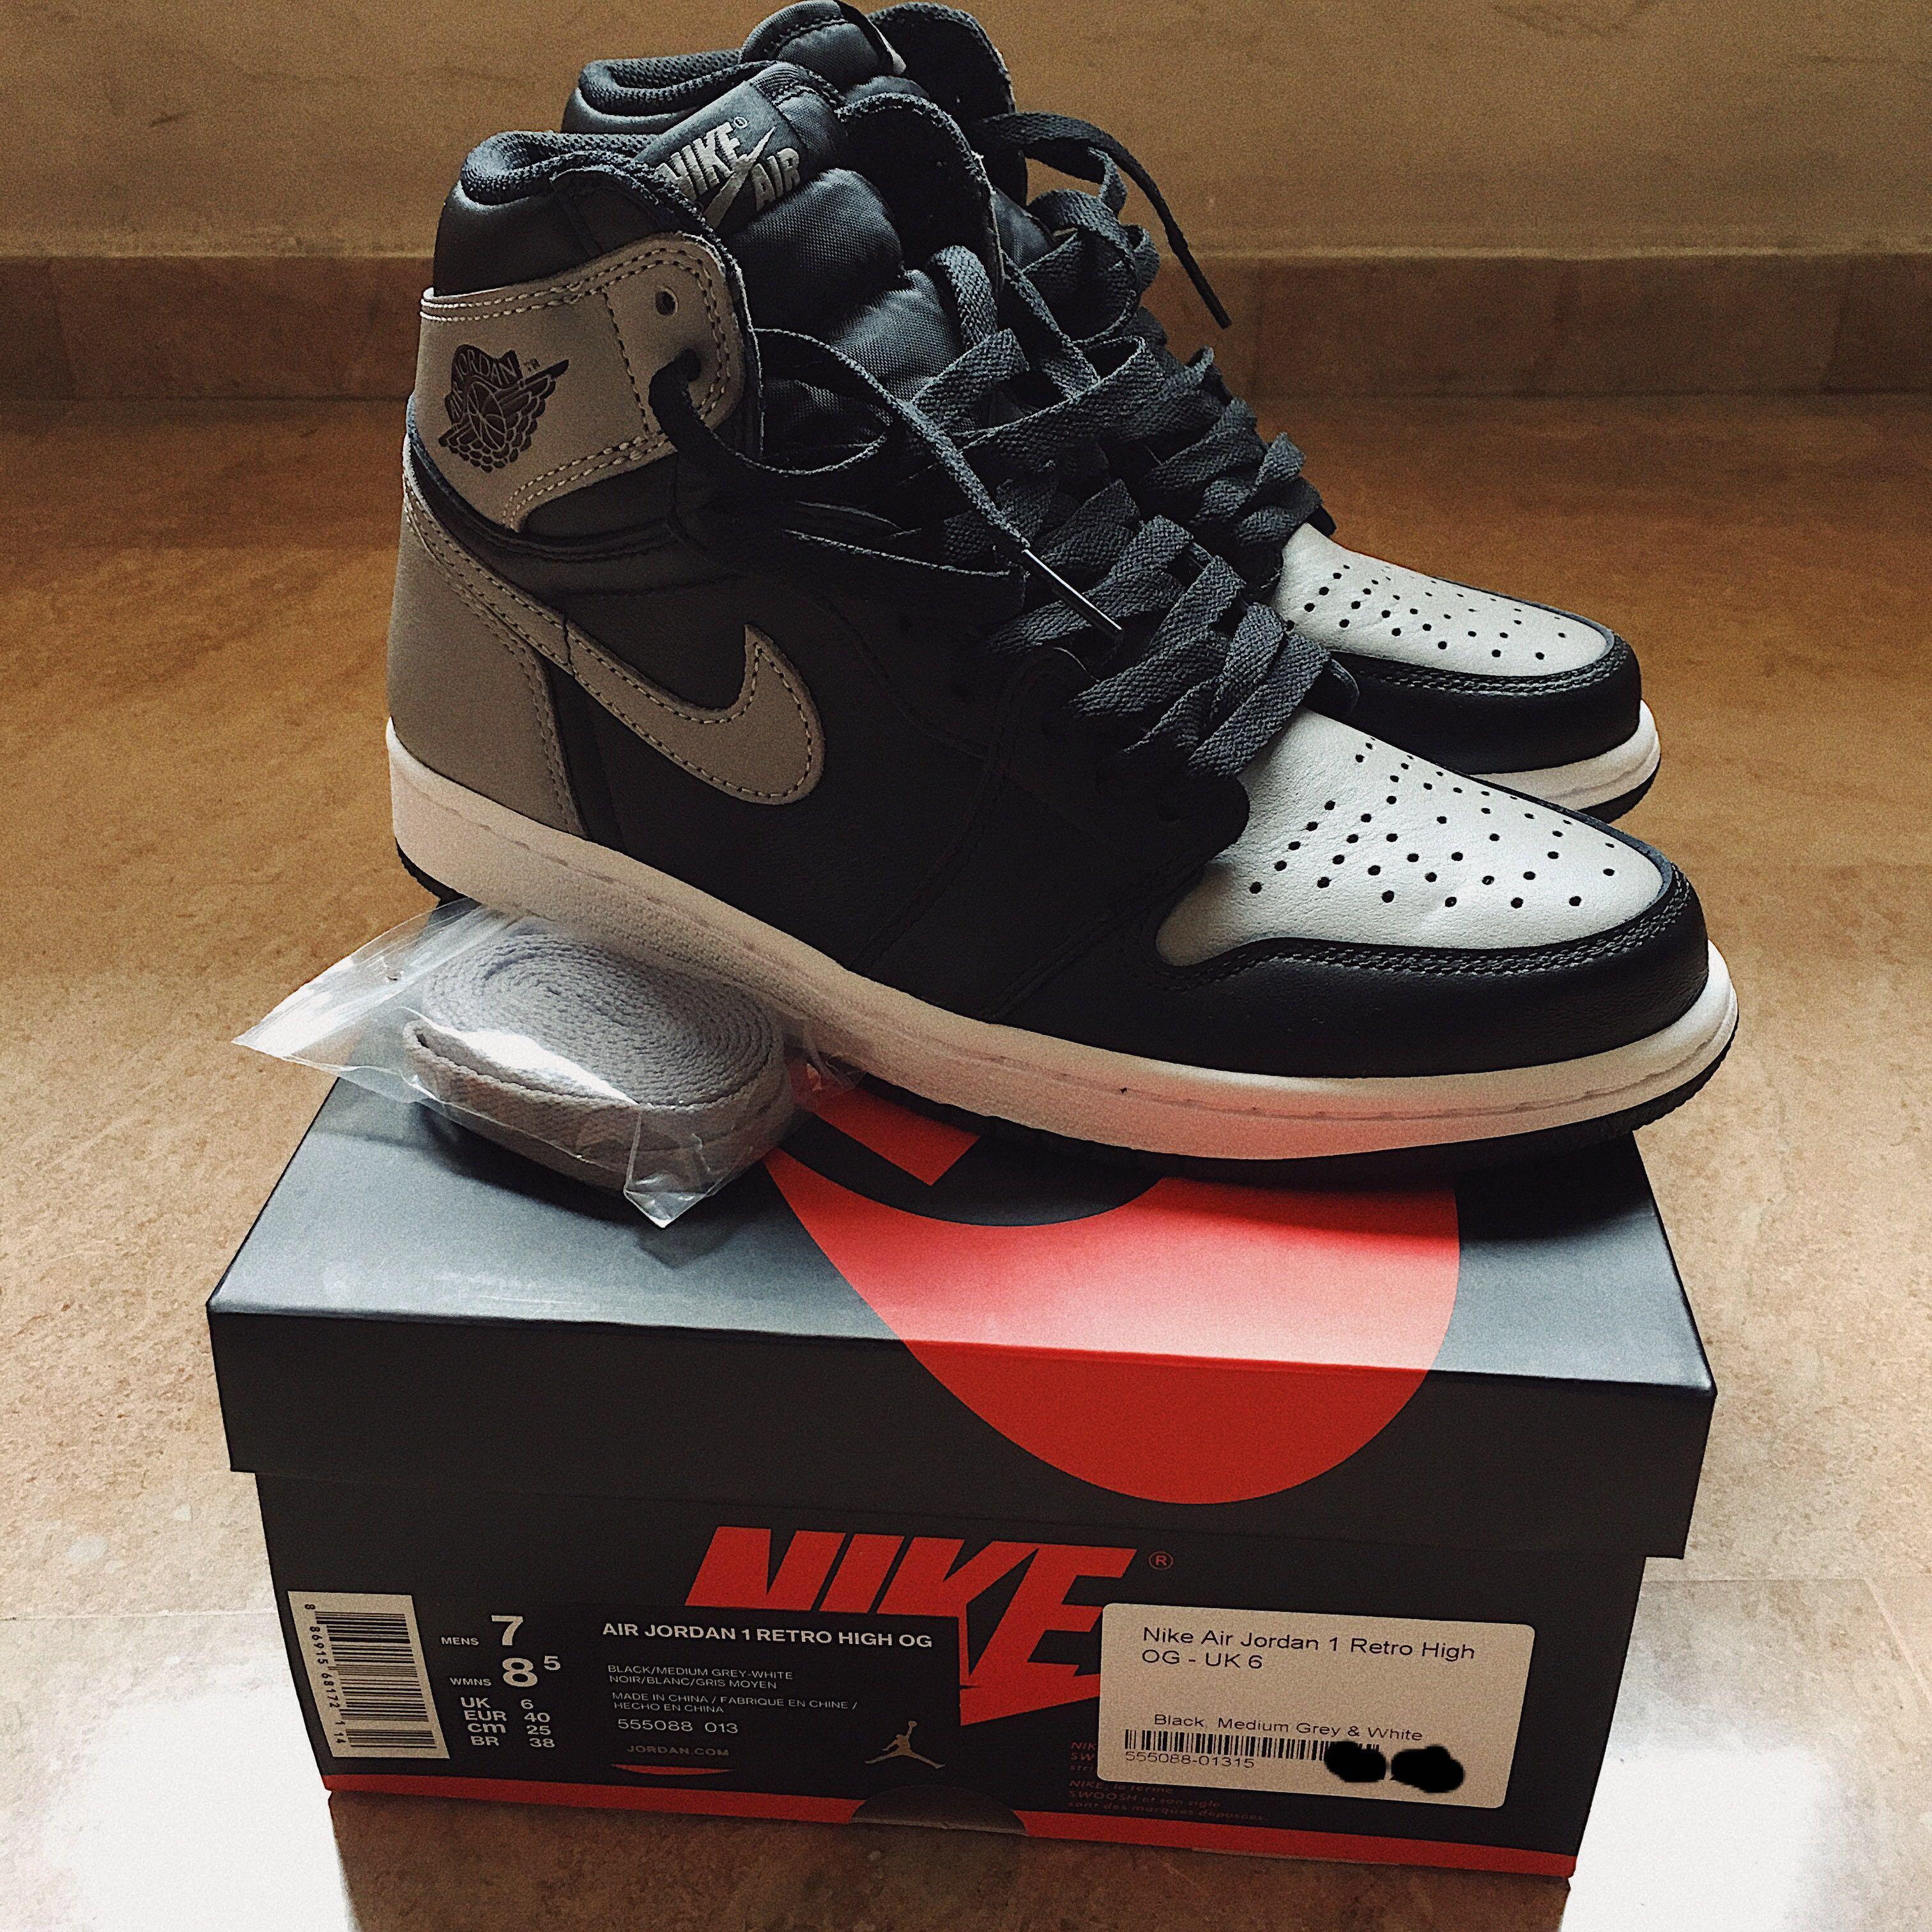 sports shoes 81e57 4519a Nike Air Jordan 1 Retro High OG, Men's Fashion, Footwear, Sneakers ...